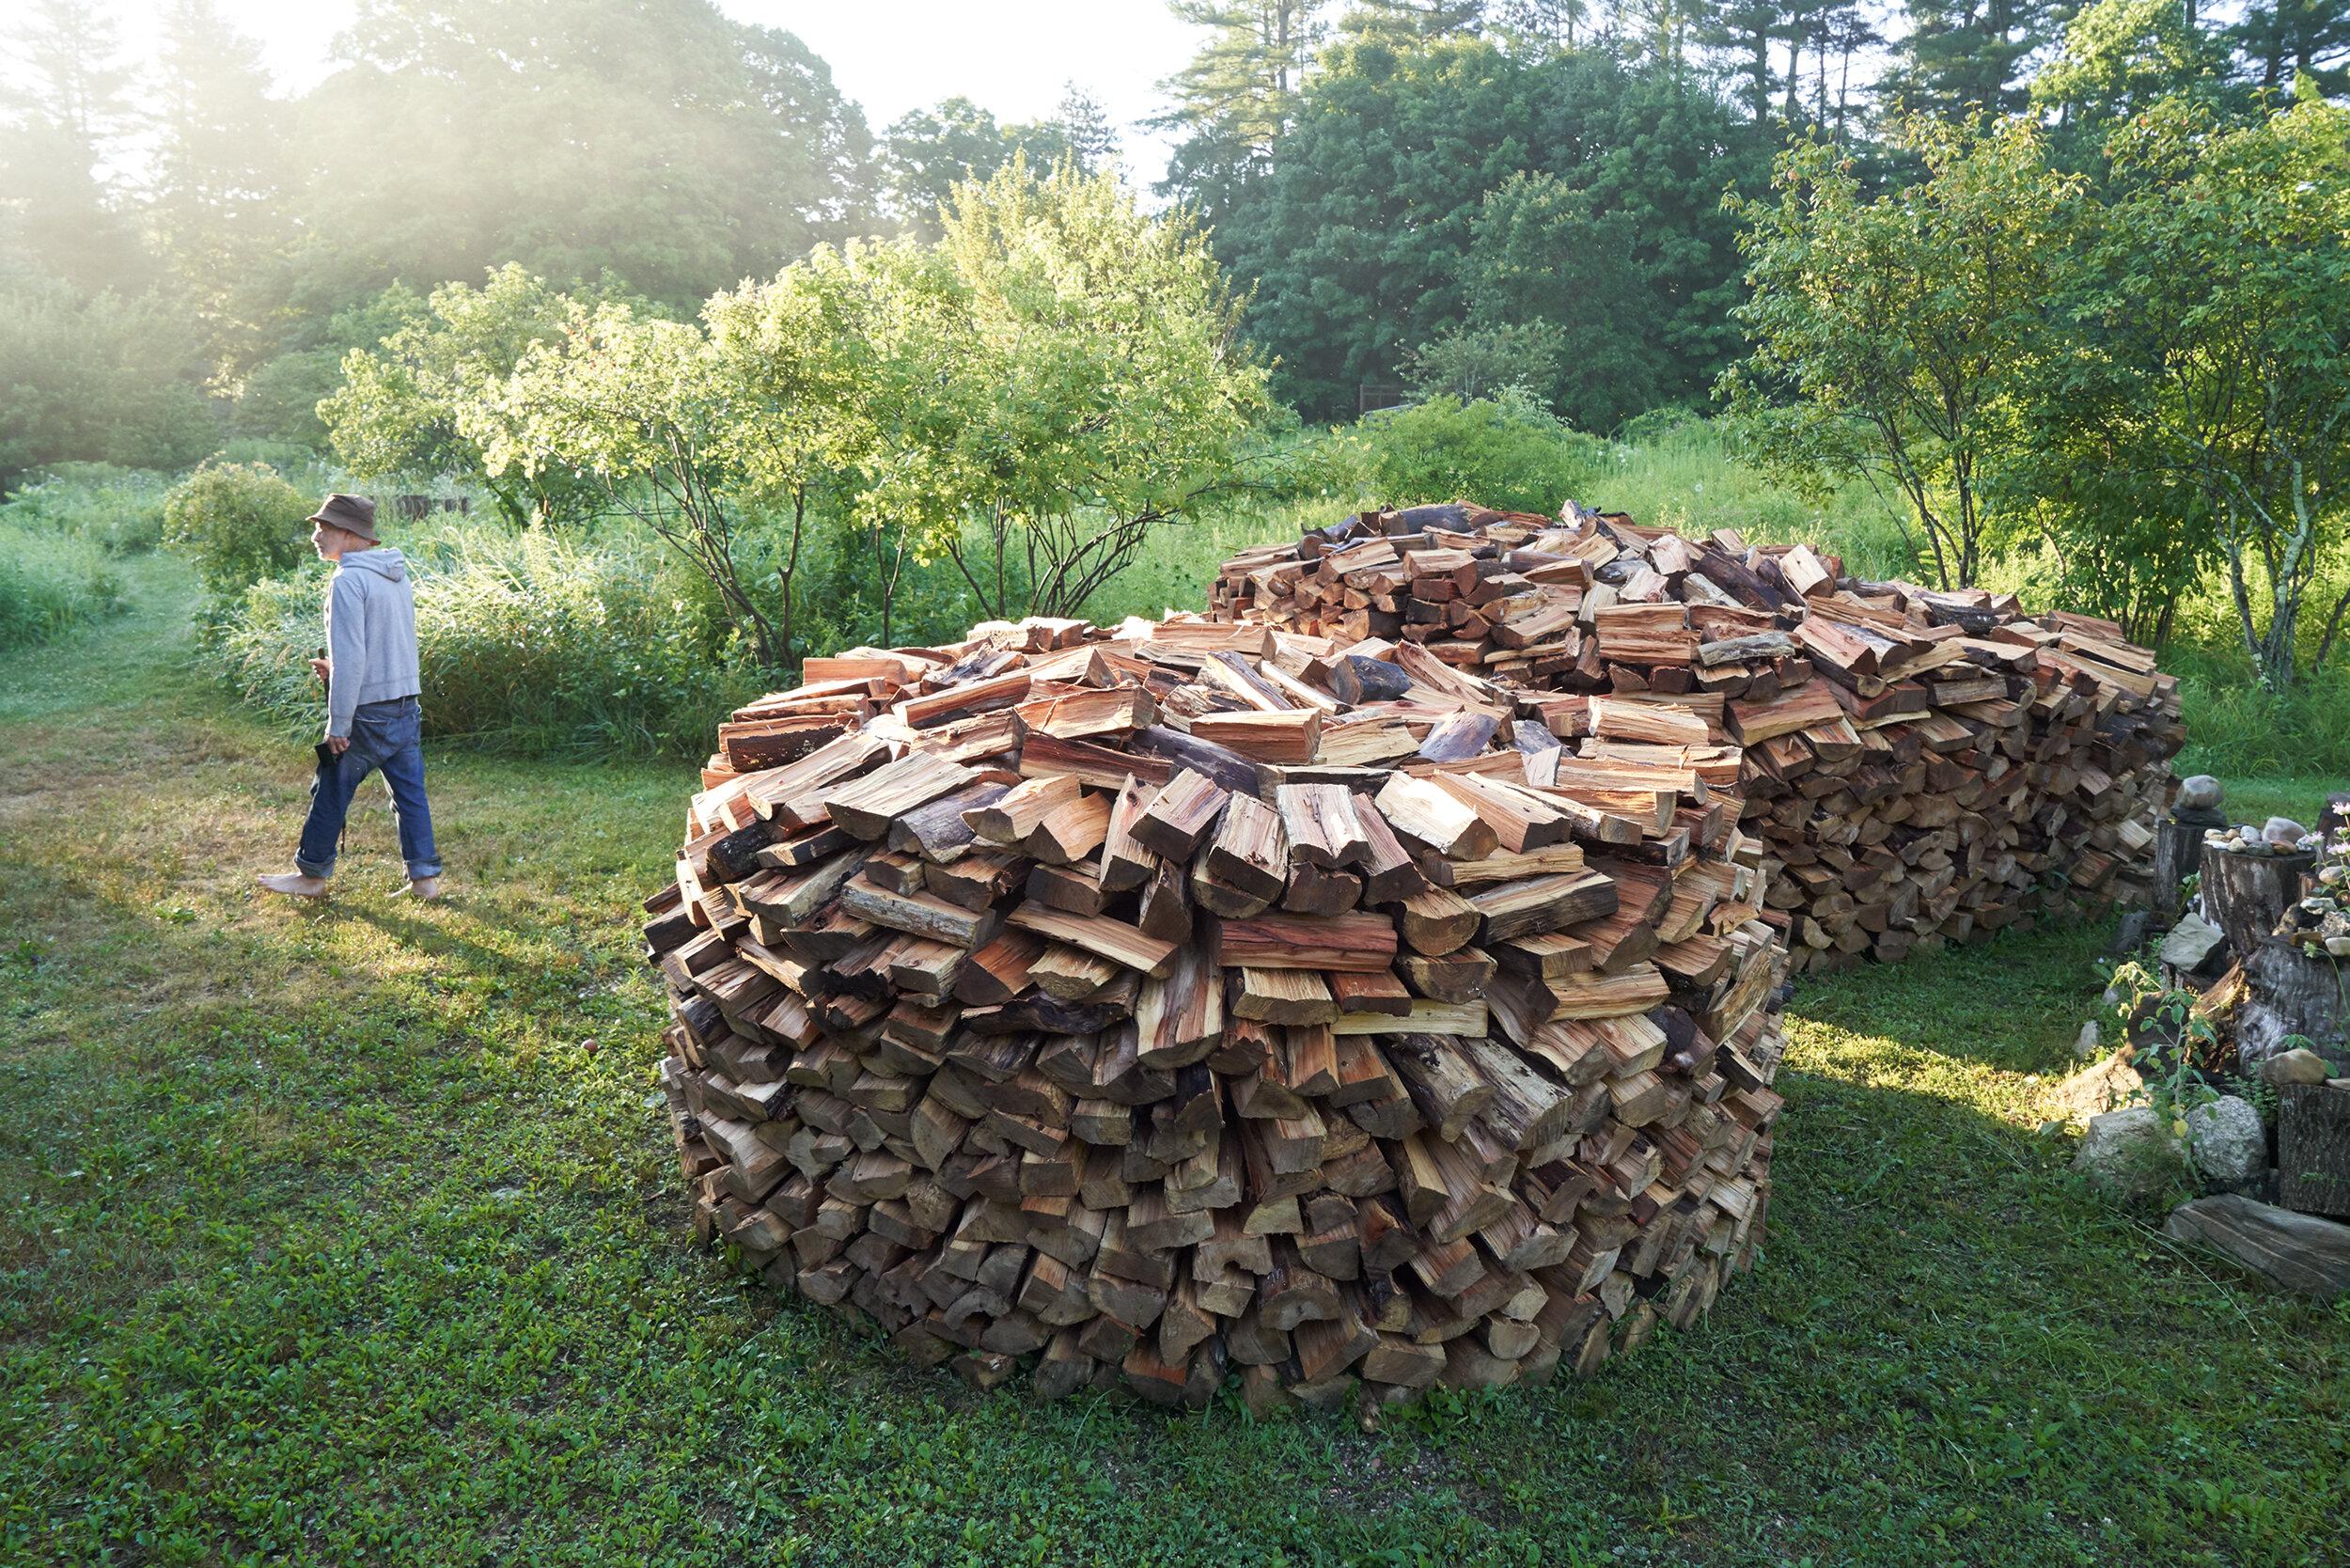 Wood stacks.